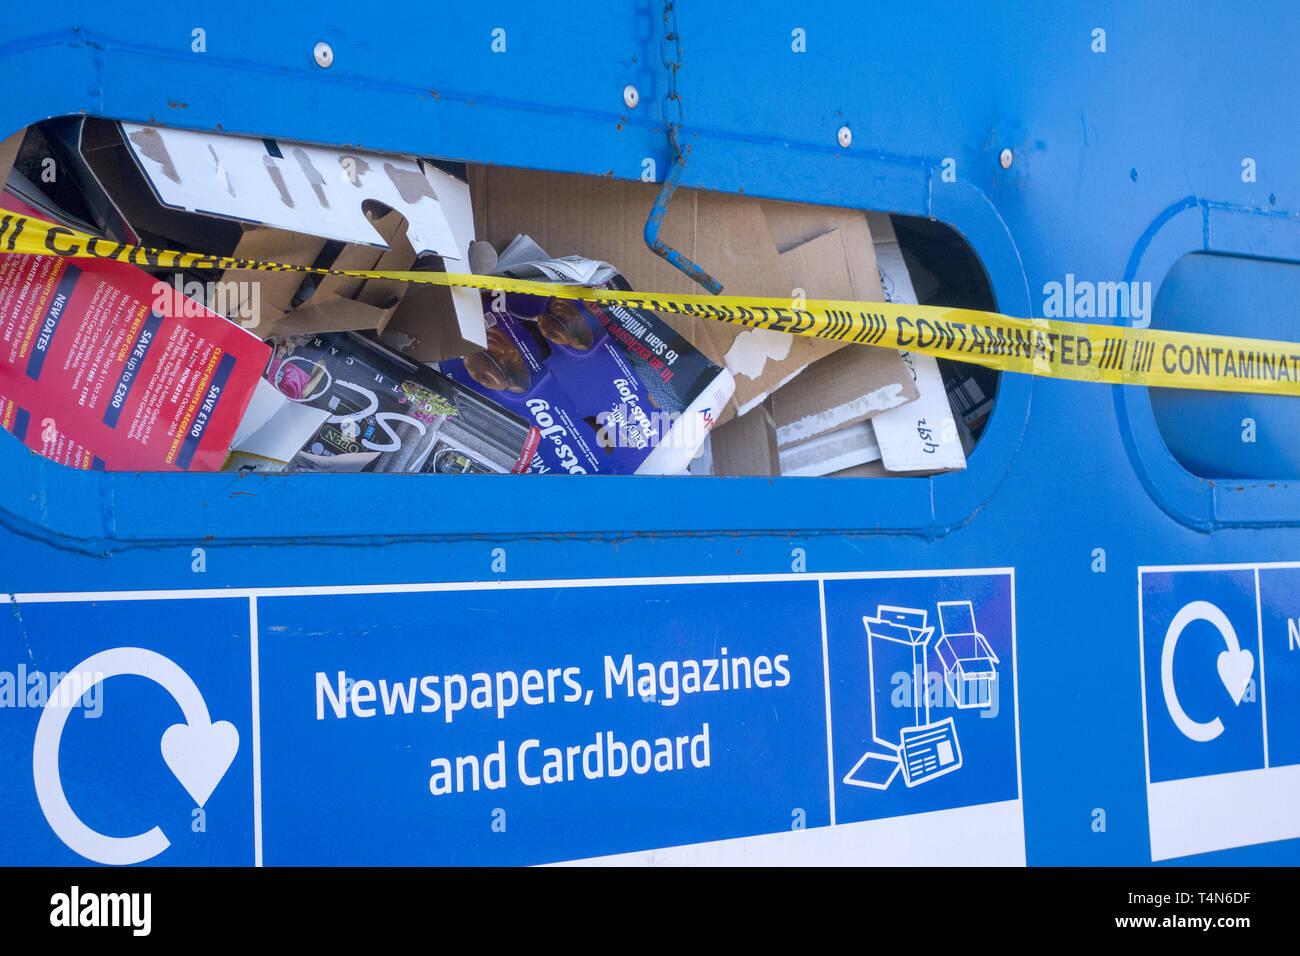 Contaminated recycling bin - Stock Image